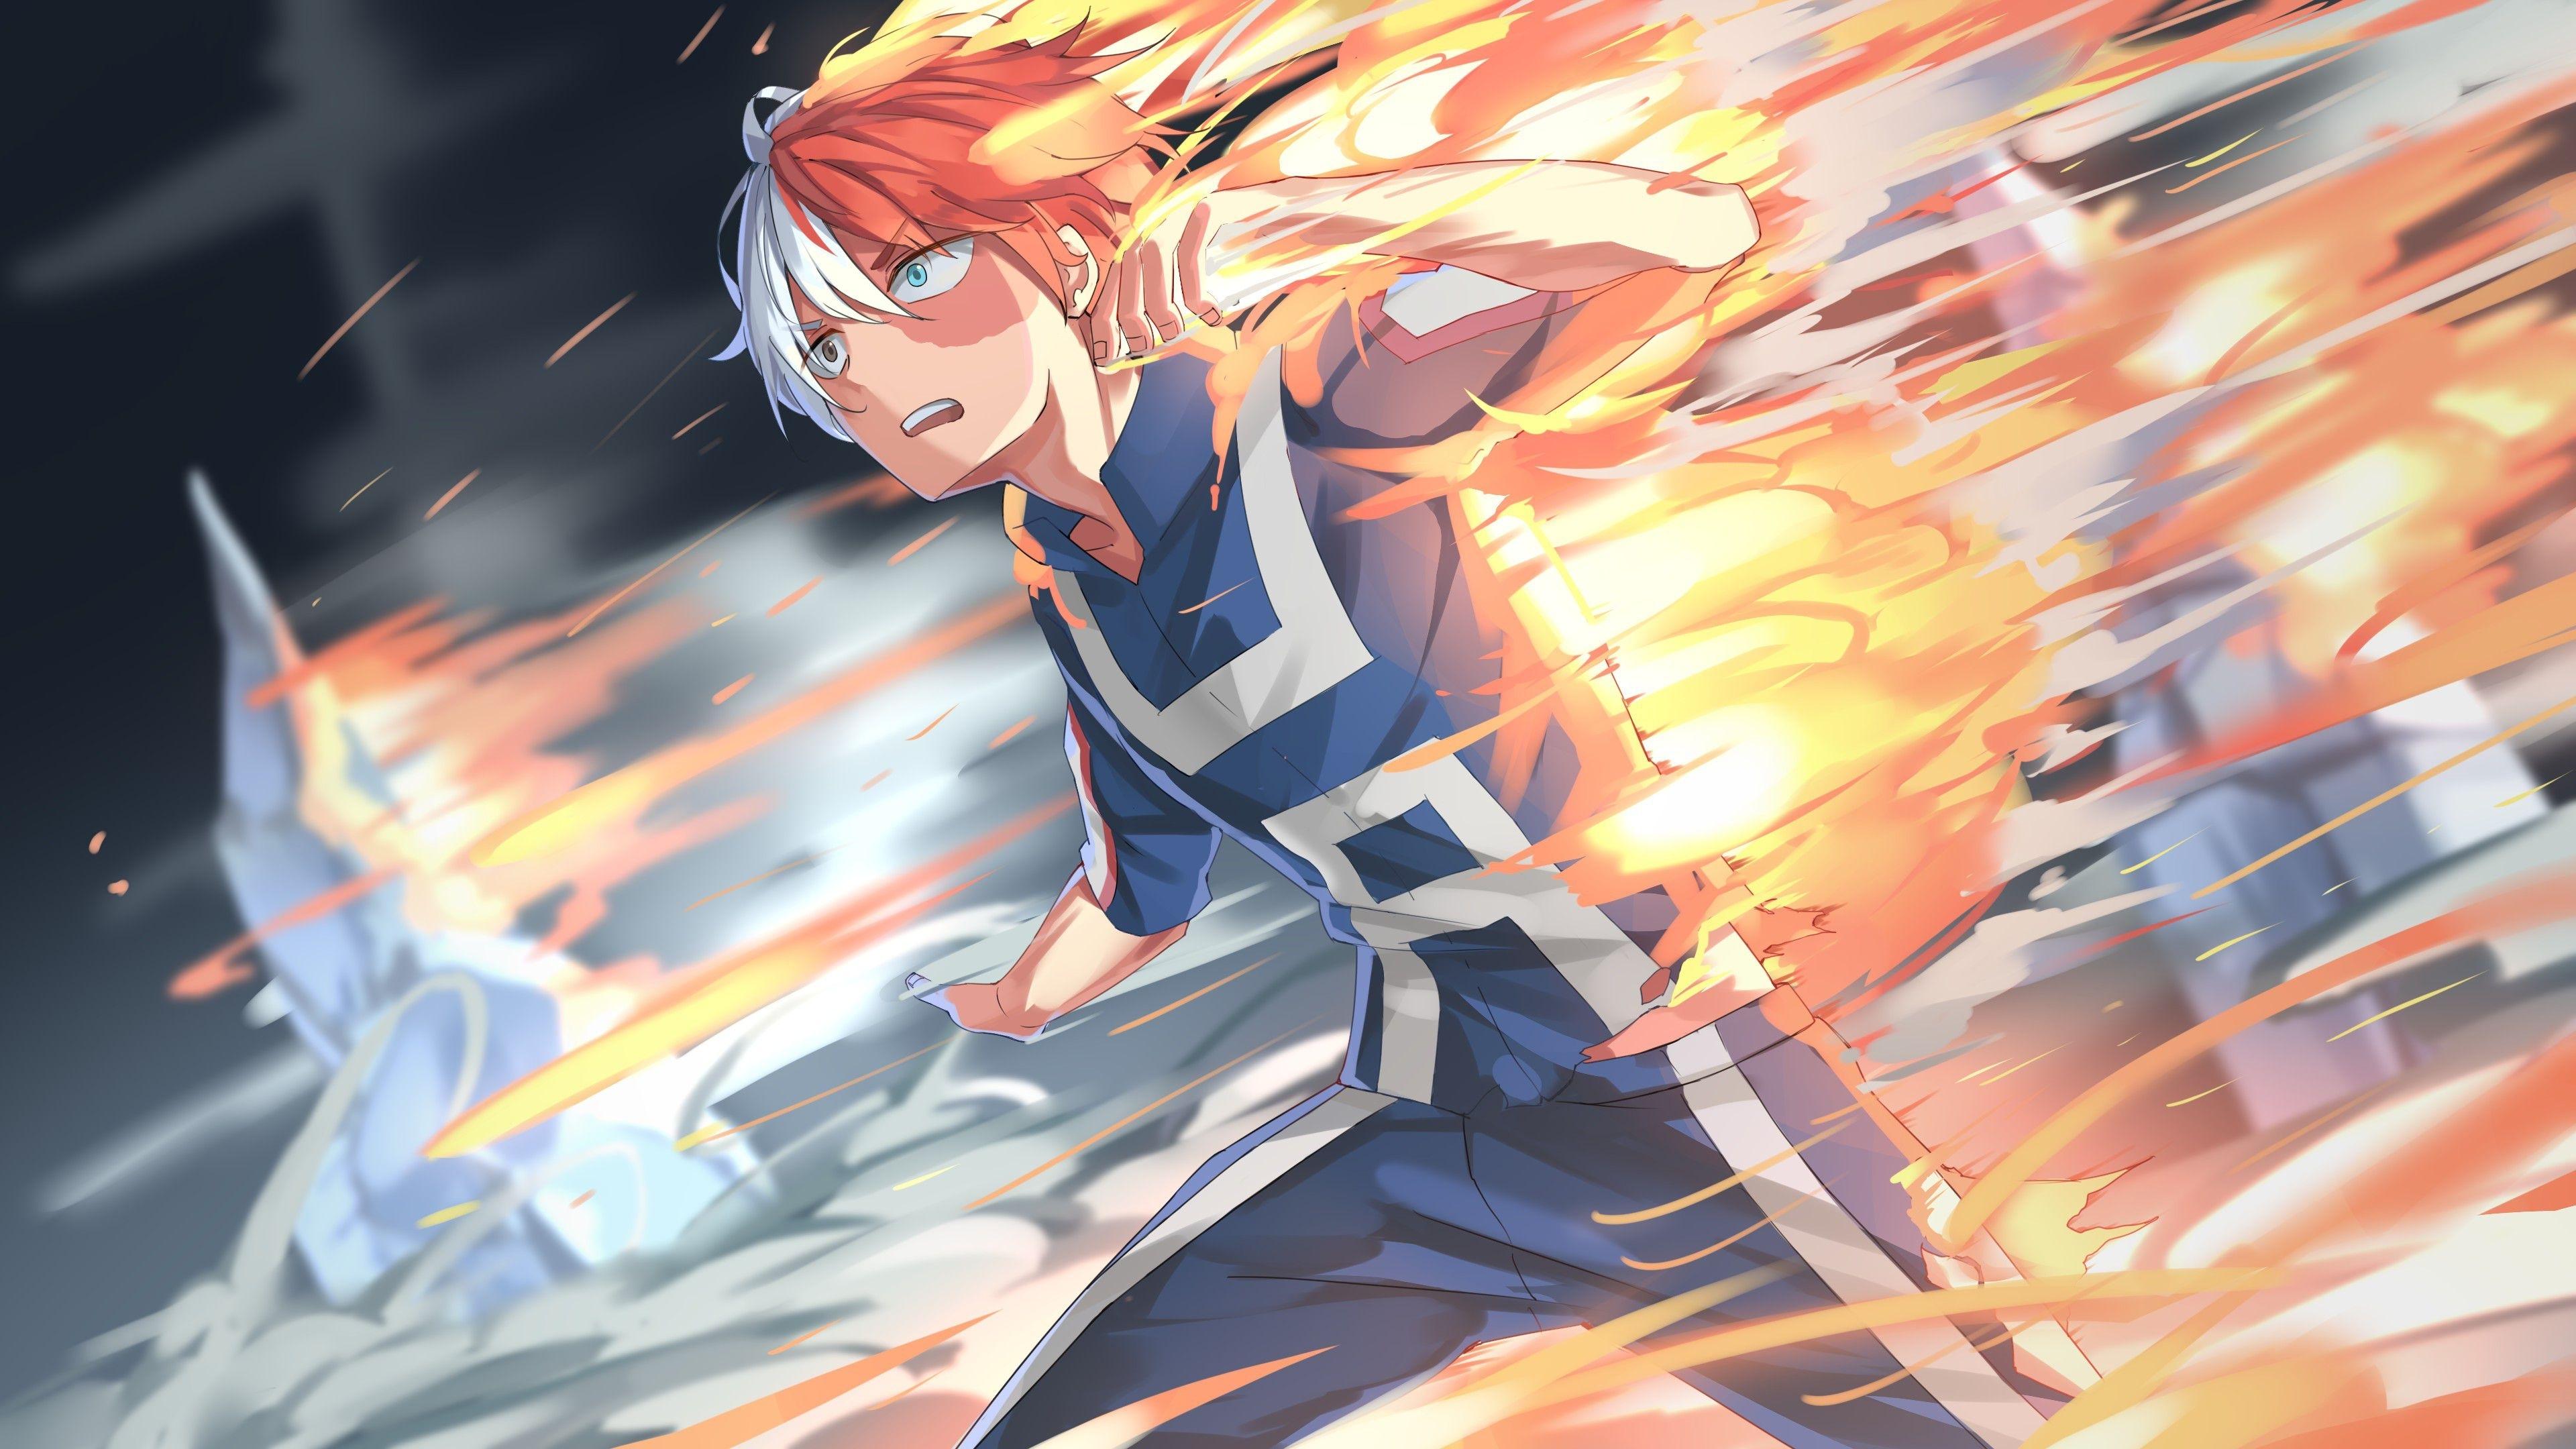 Download 97 Background Anime Pc Terbaik